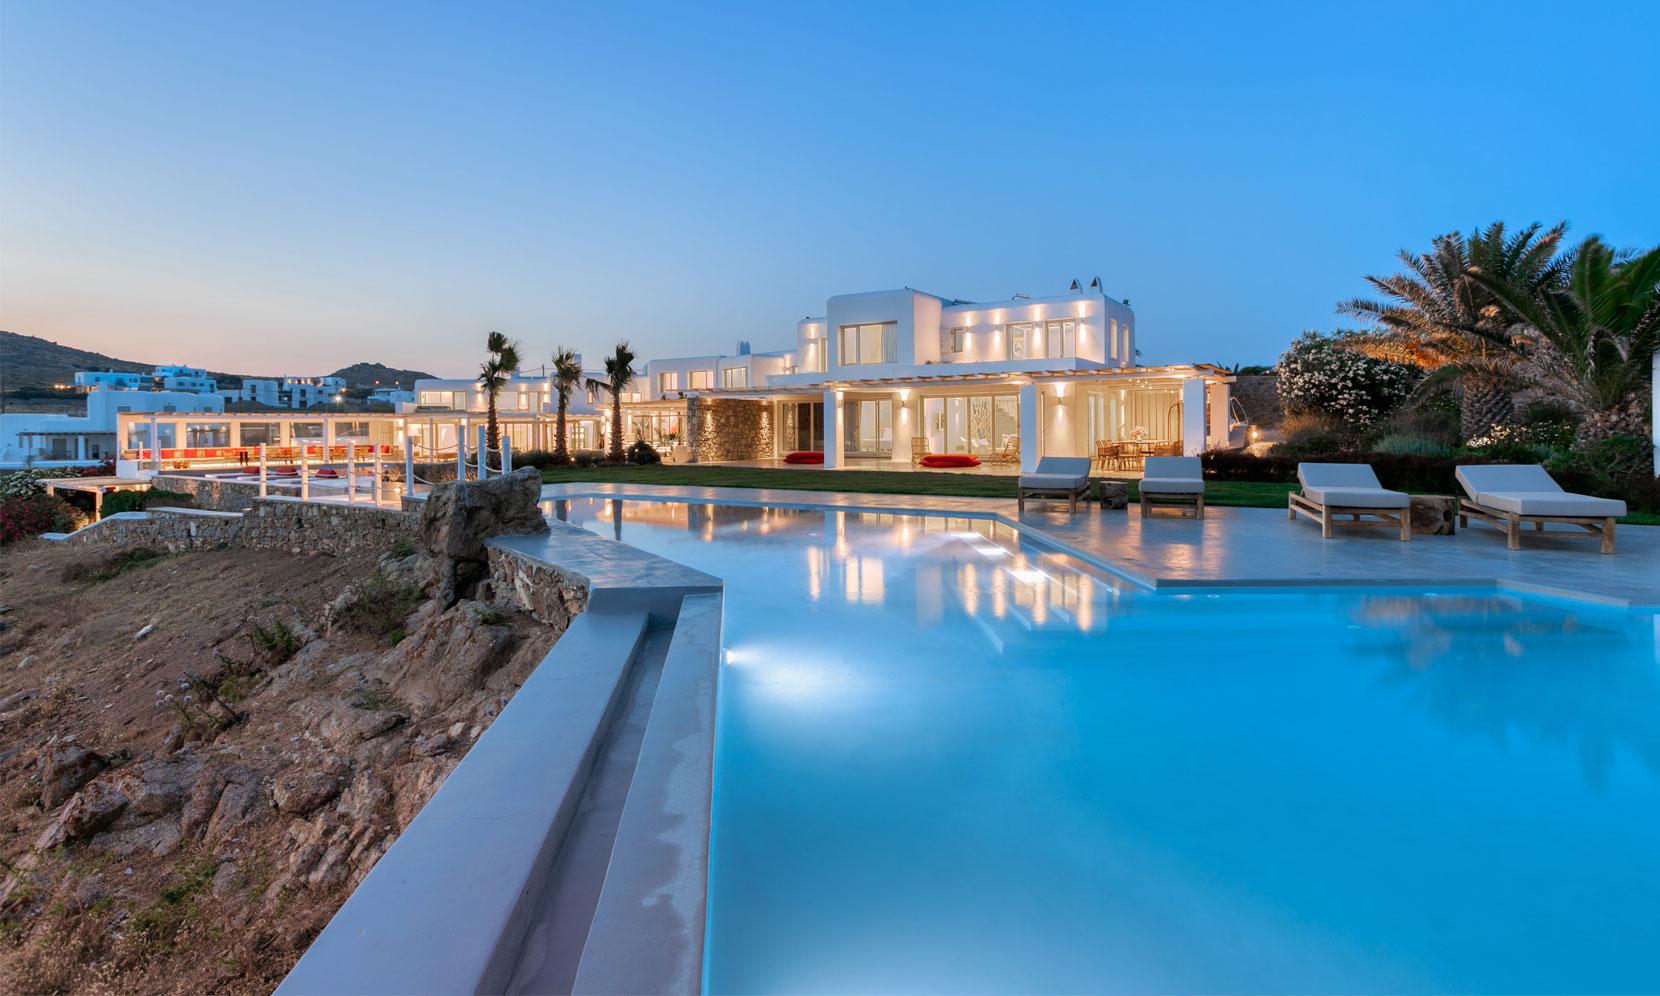 Mykonos Villa Alexander jumbotron image